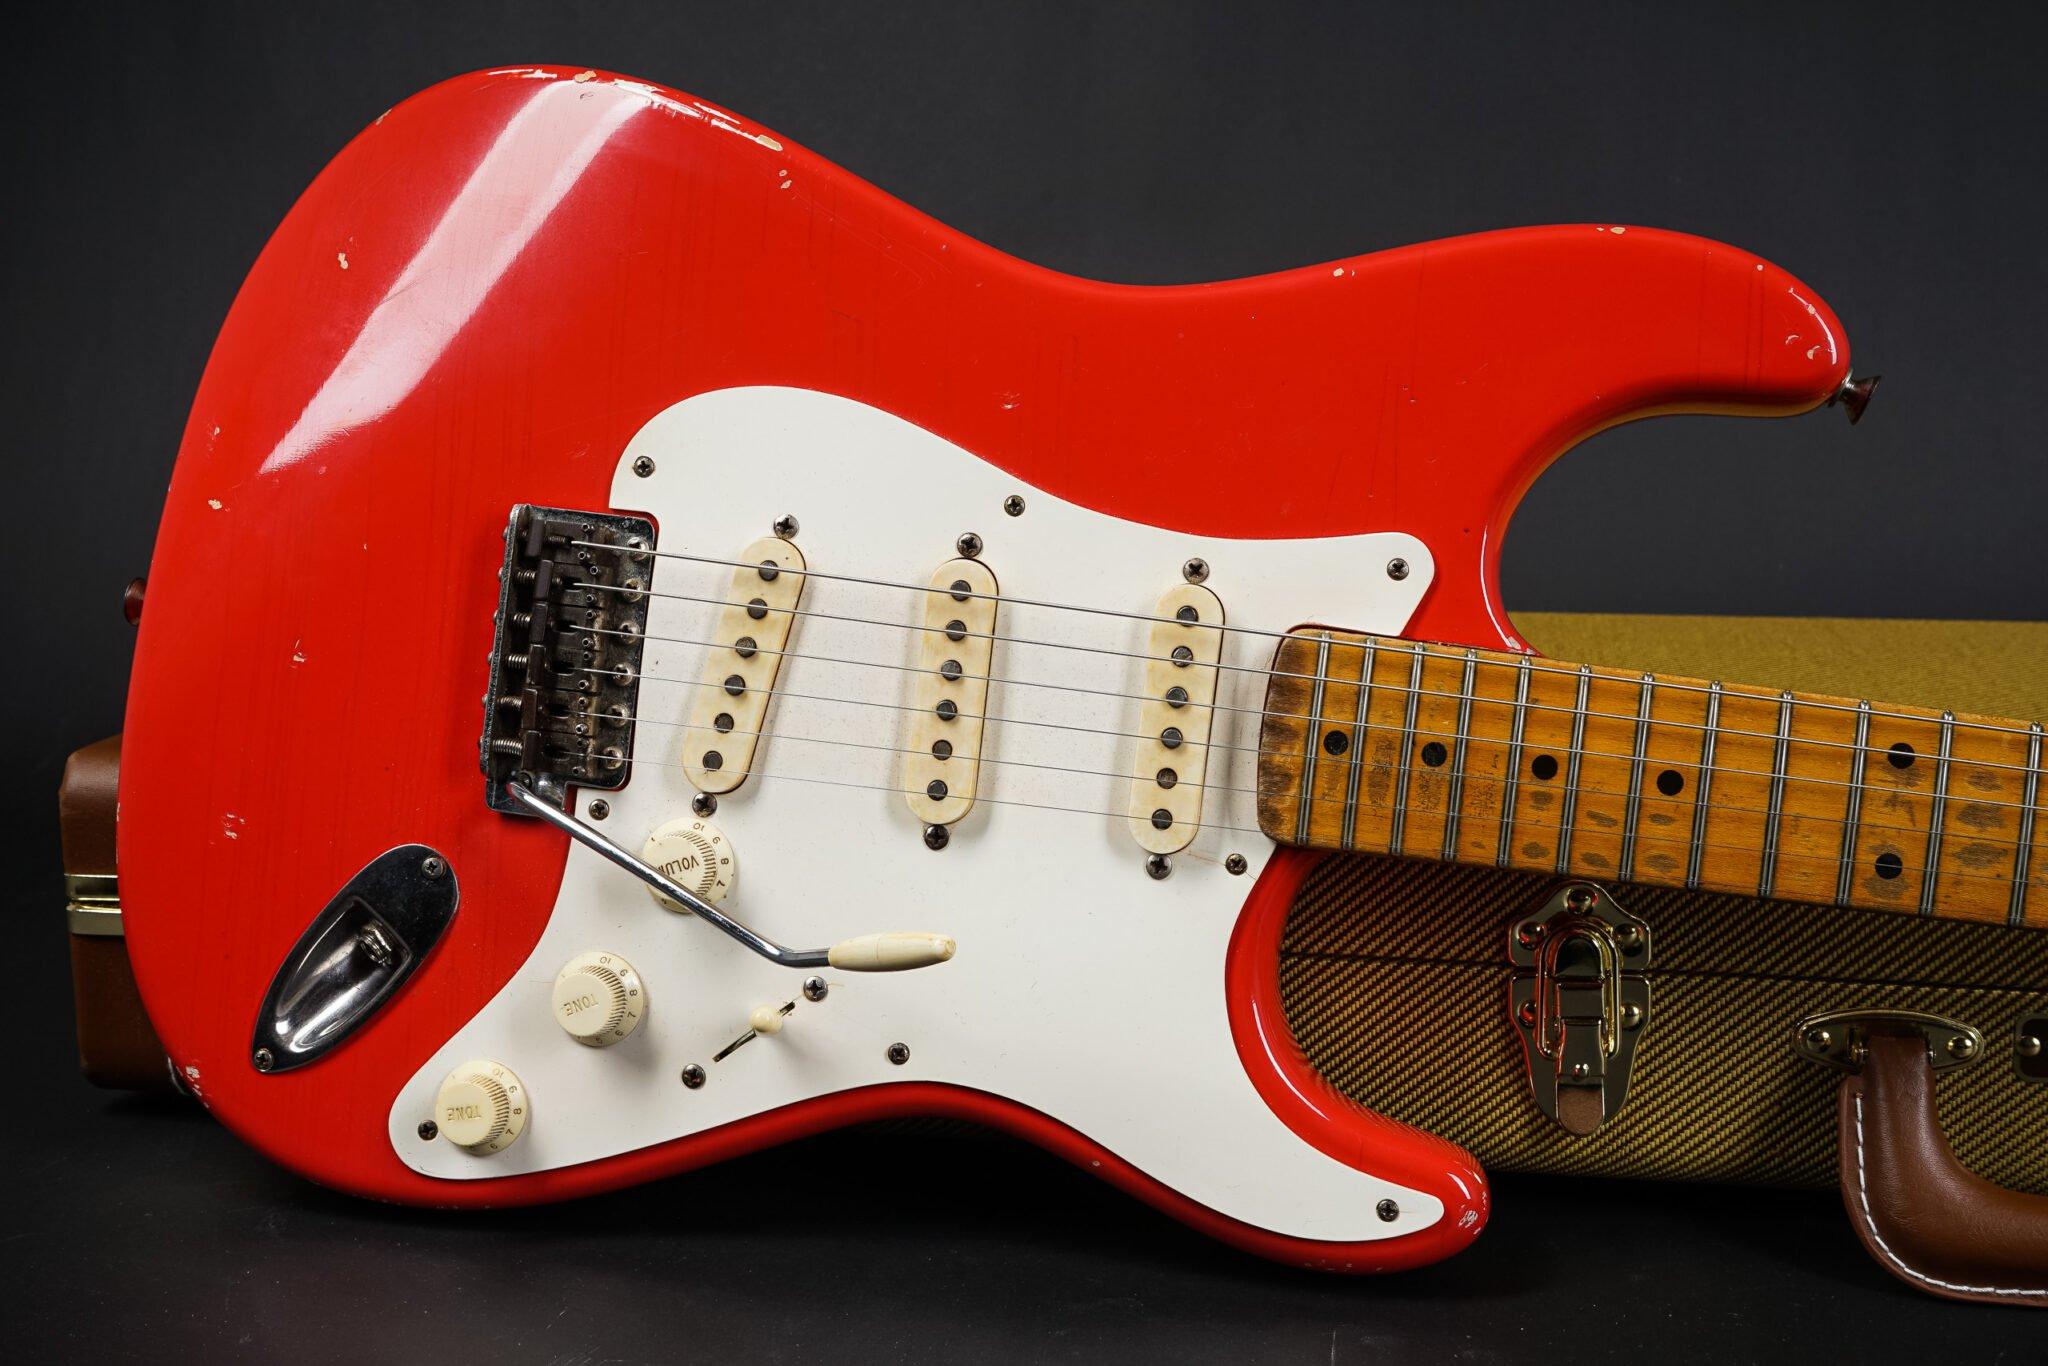 https://guitarpoint.de/app/uploads/products/1957-fender-stratocaster-fiesta-red-refin-314kg/1957-Fender-Stratocaster-21591-9-2048x1366.jpg